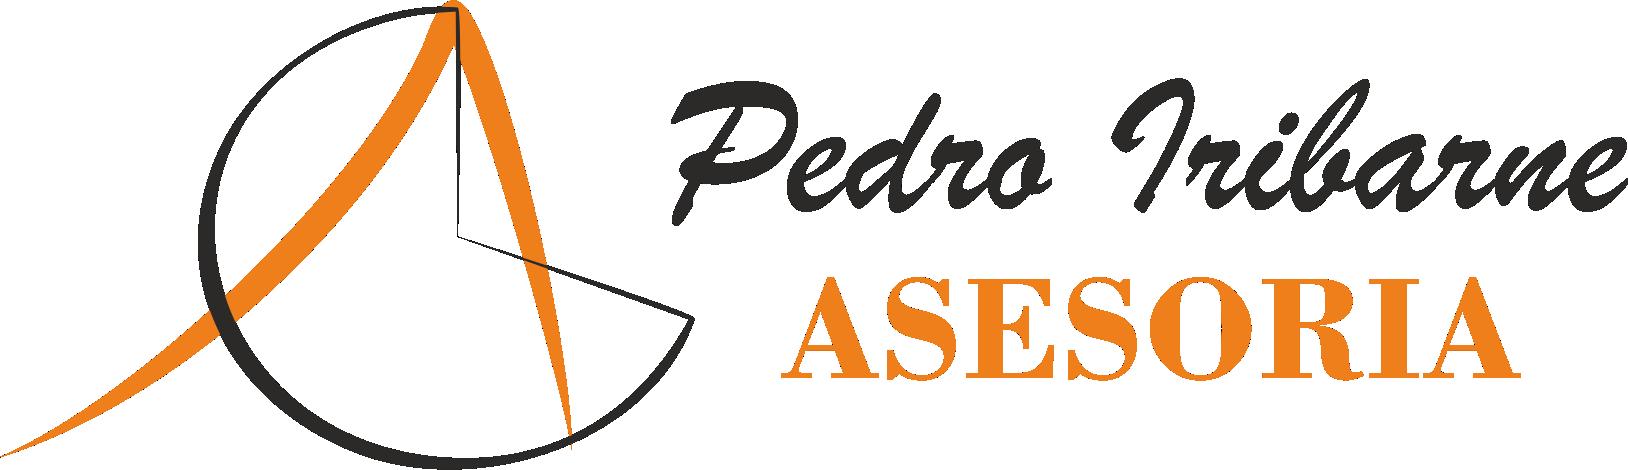 Asesoria Pedro Iribarne